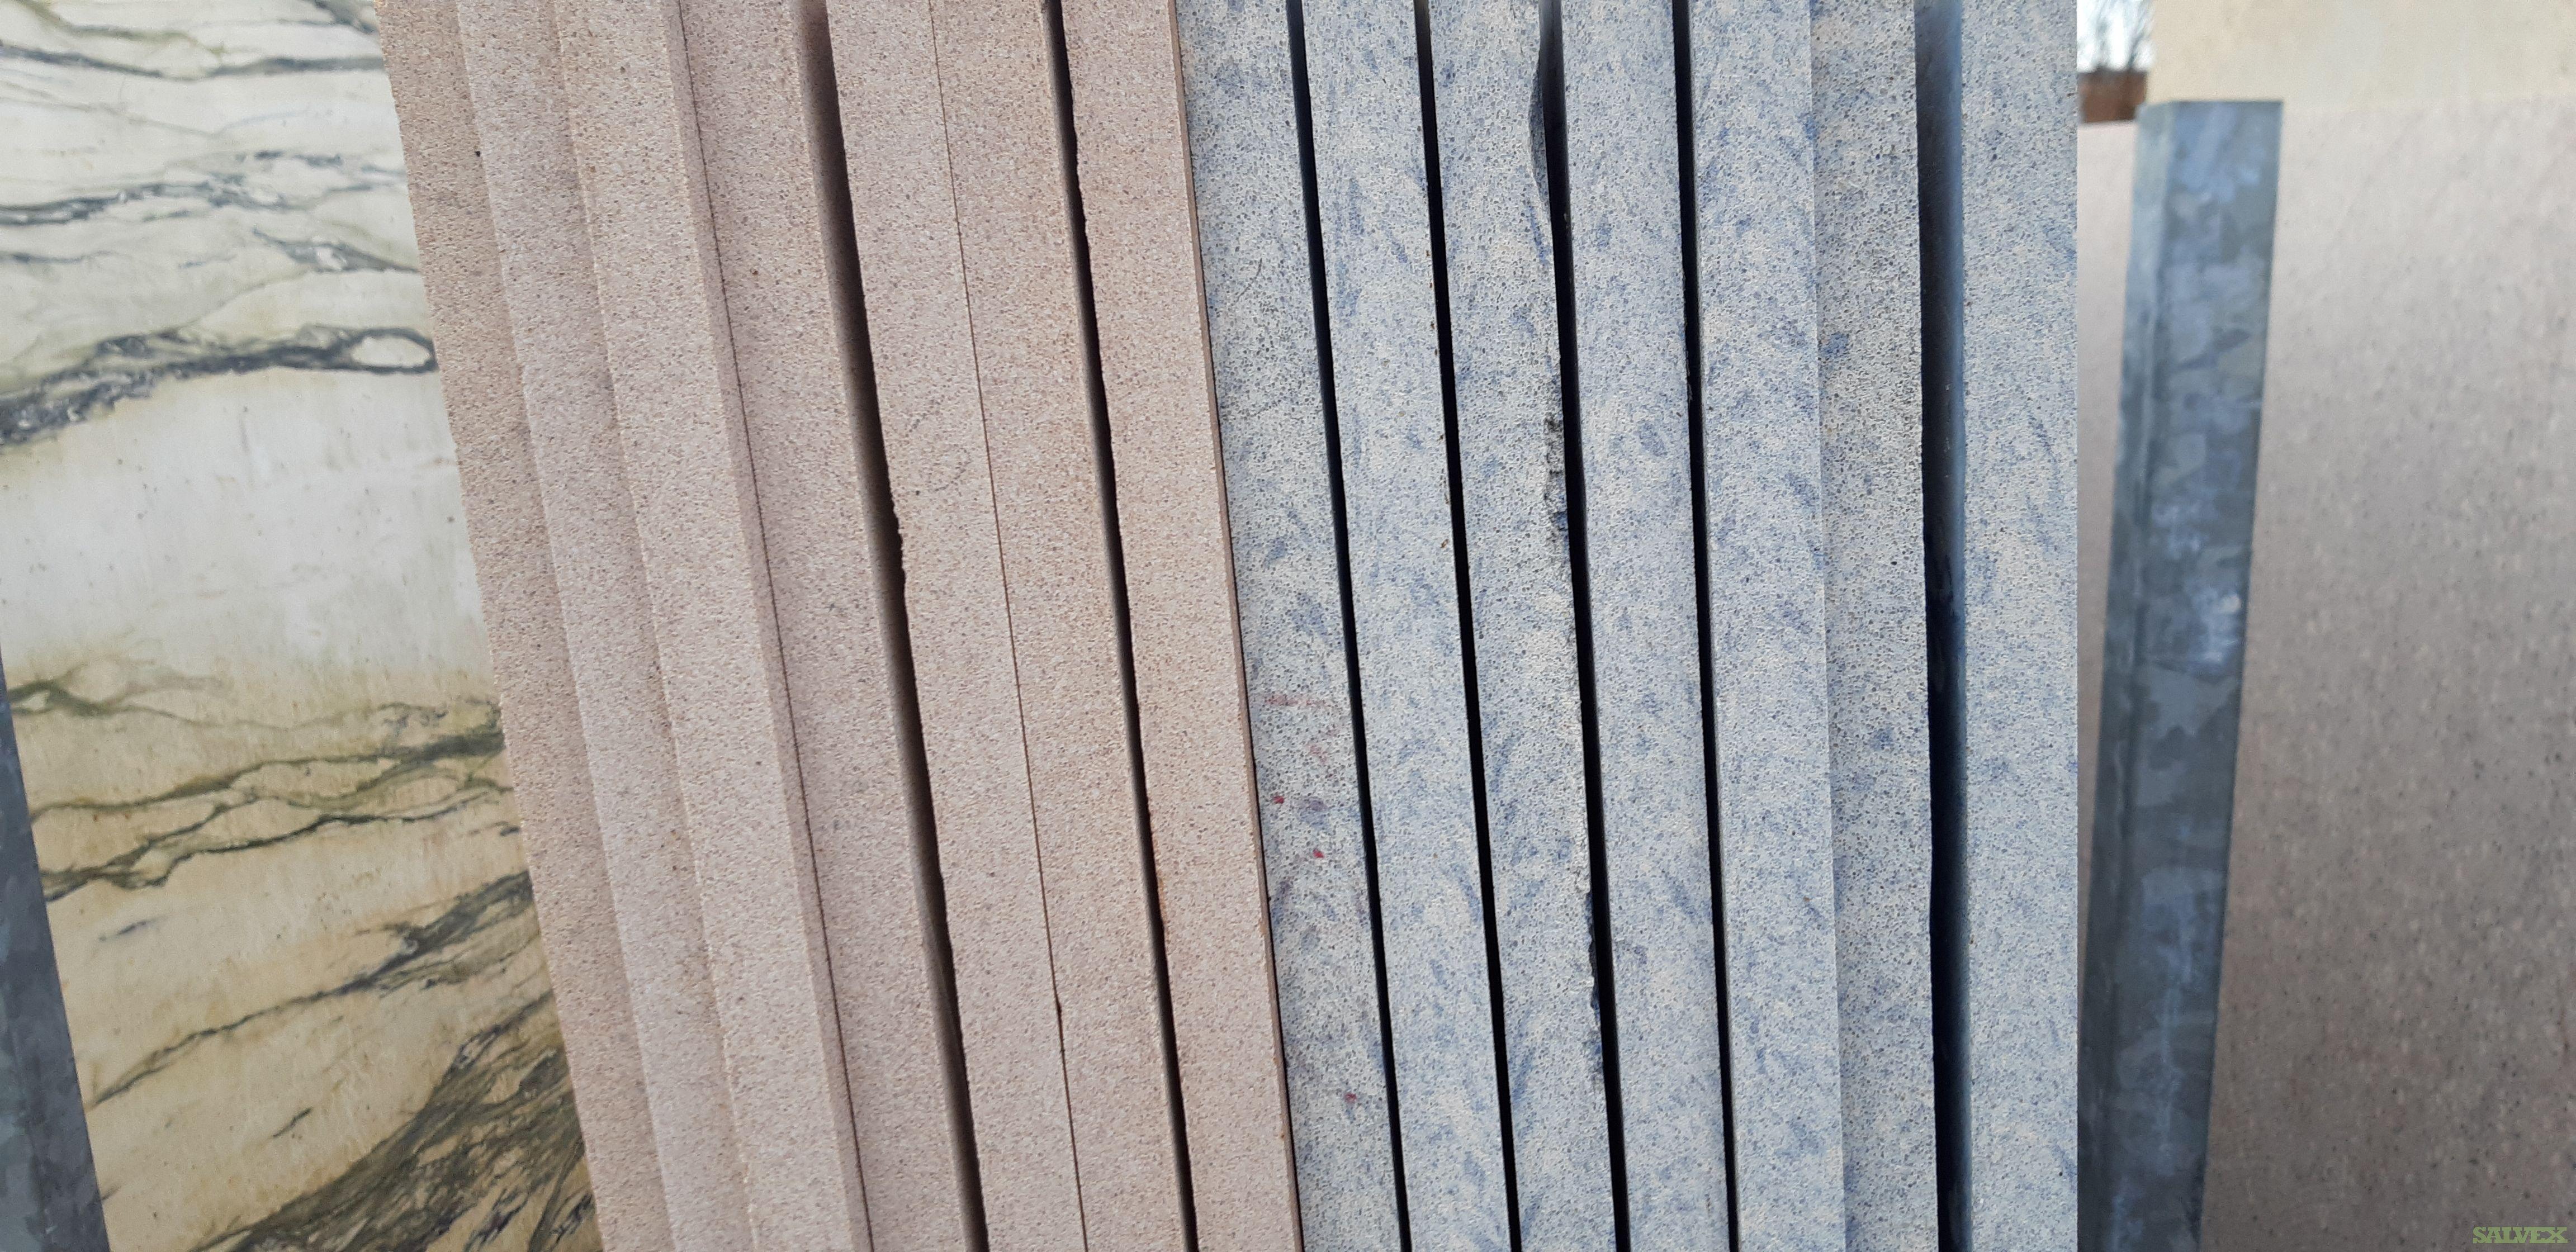 Quartz and Granite Slabs (77 Slabs / 50,375 Lbs)